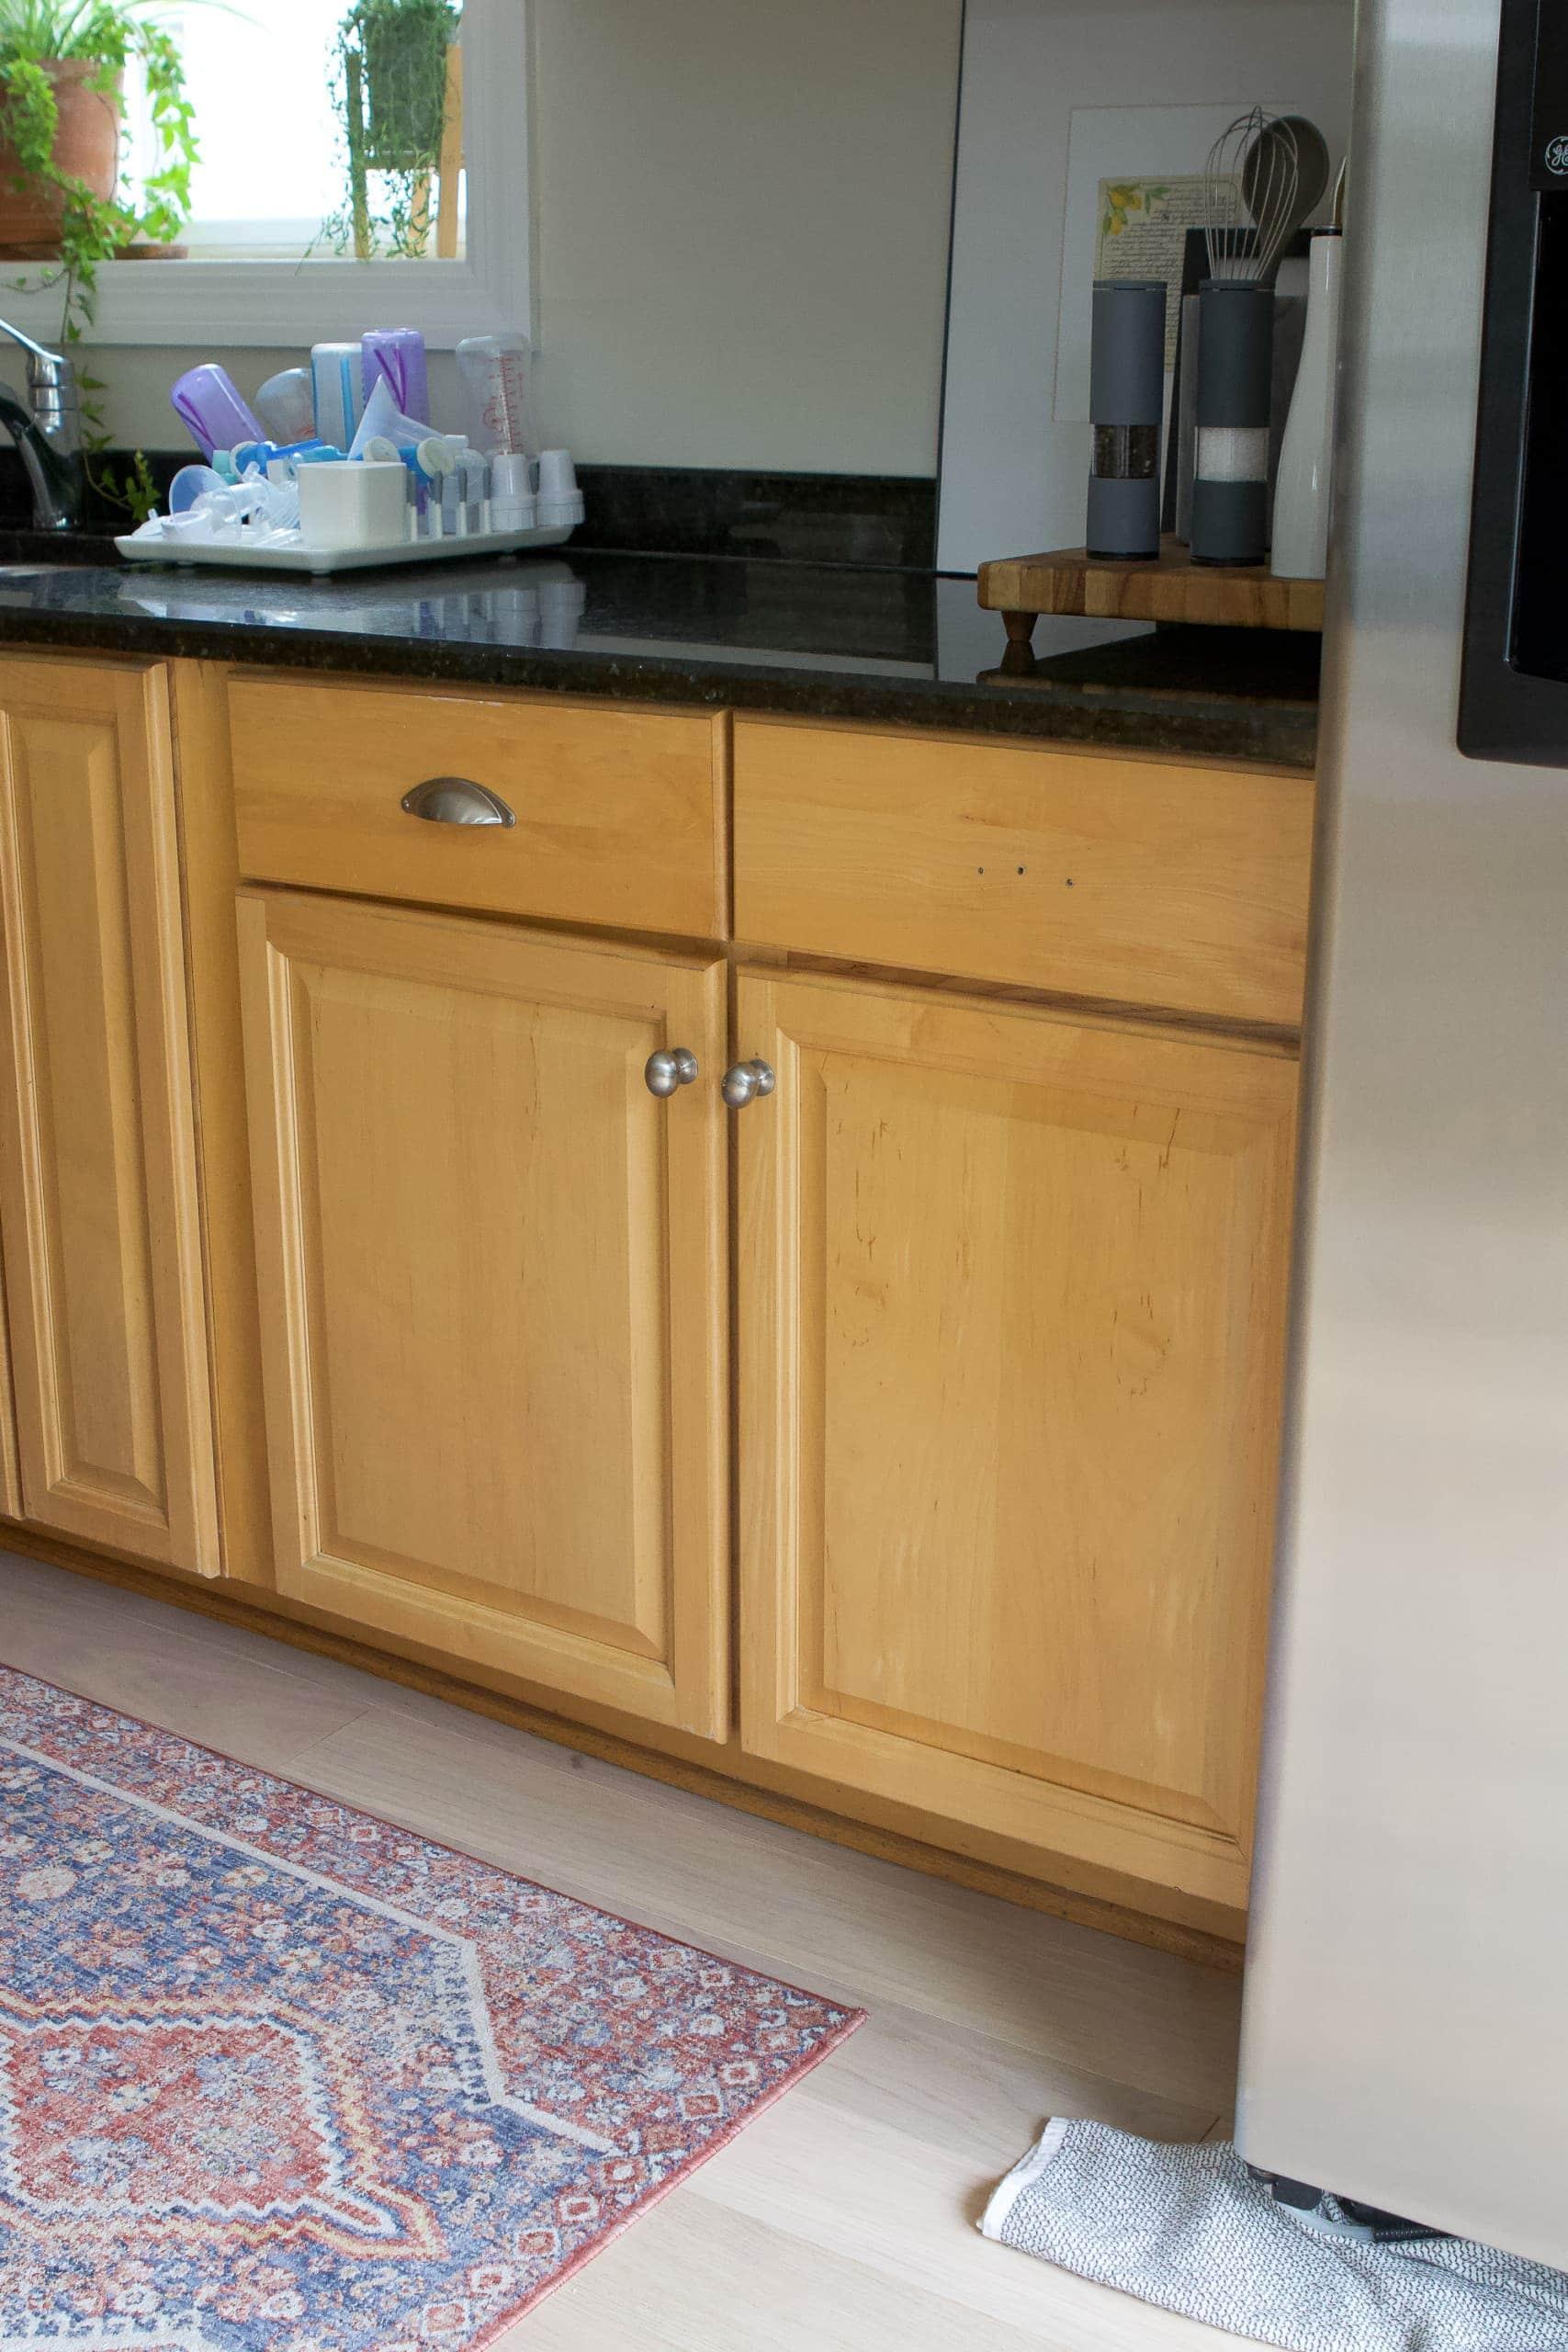 Cabinets over a basement walkout